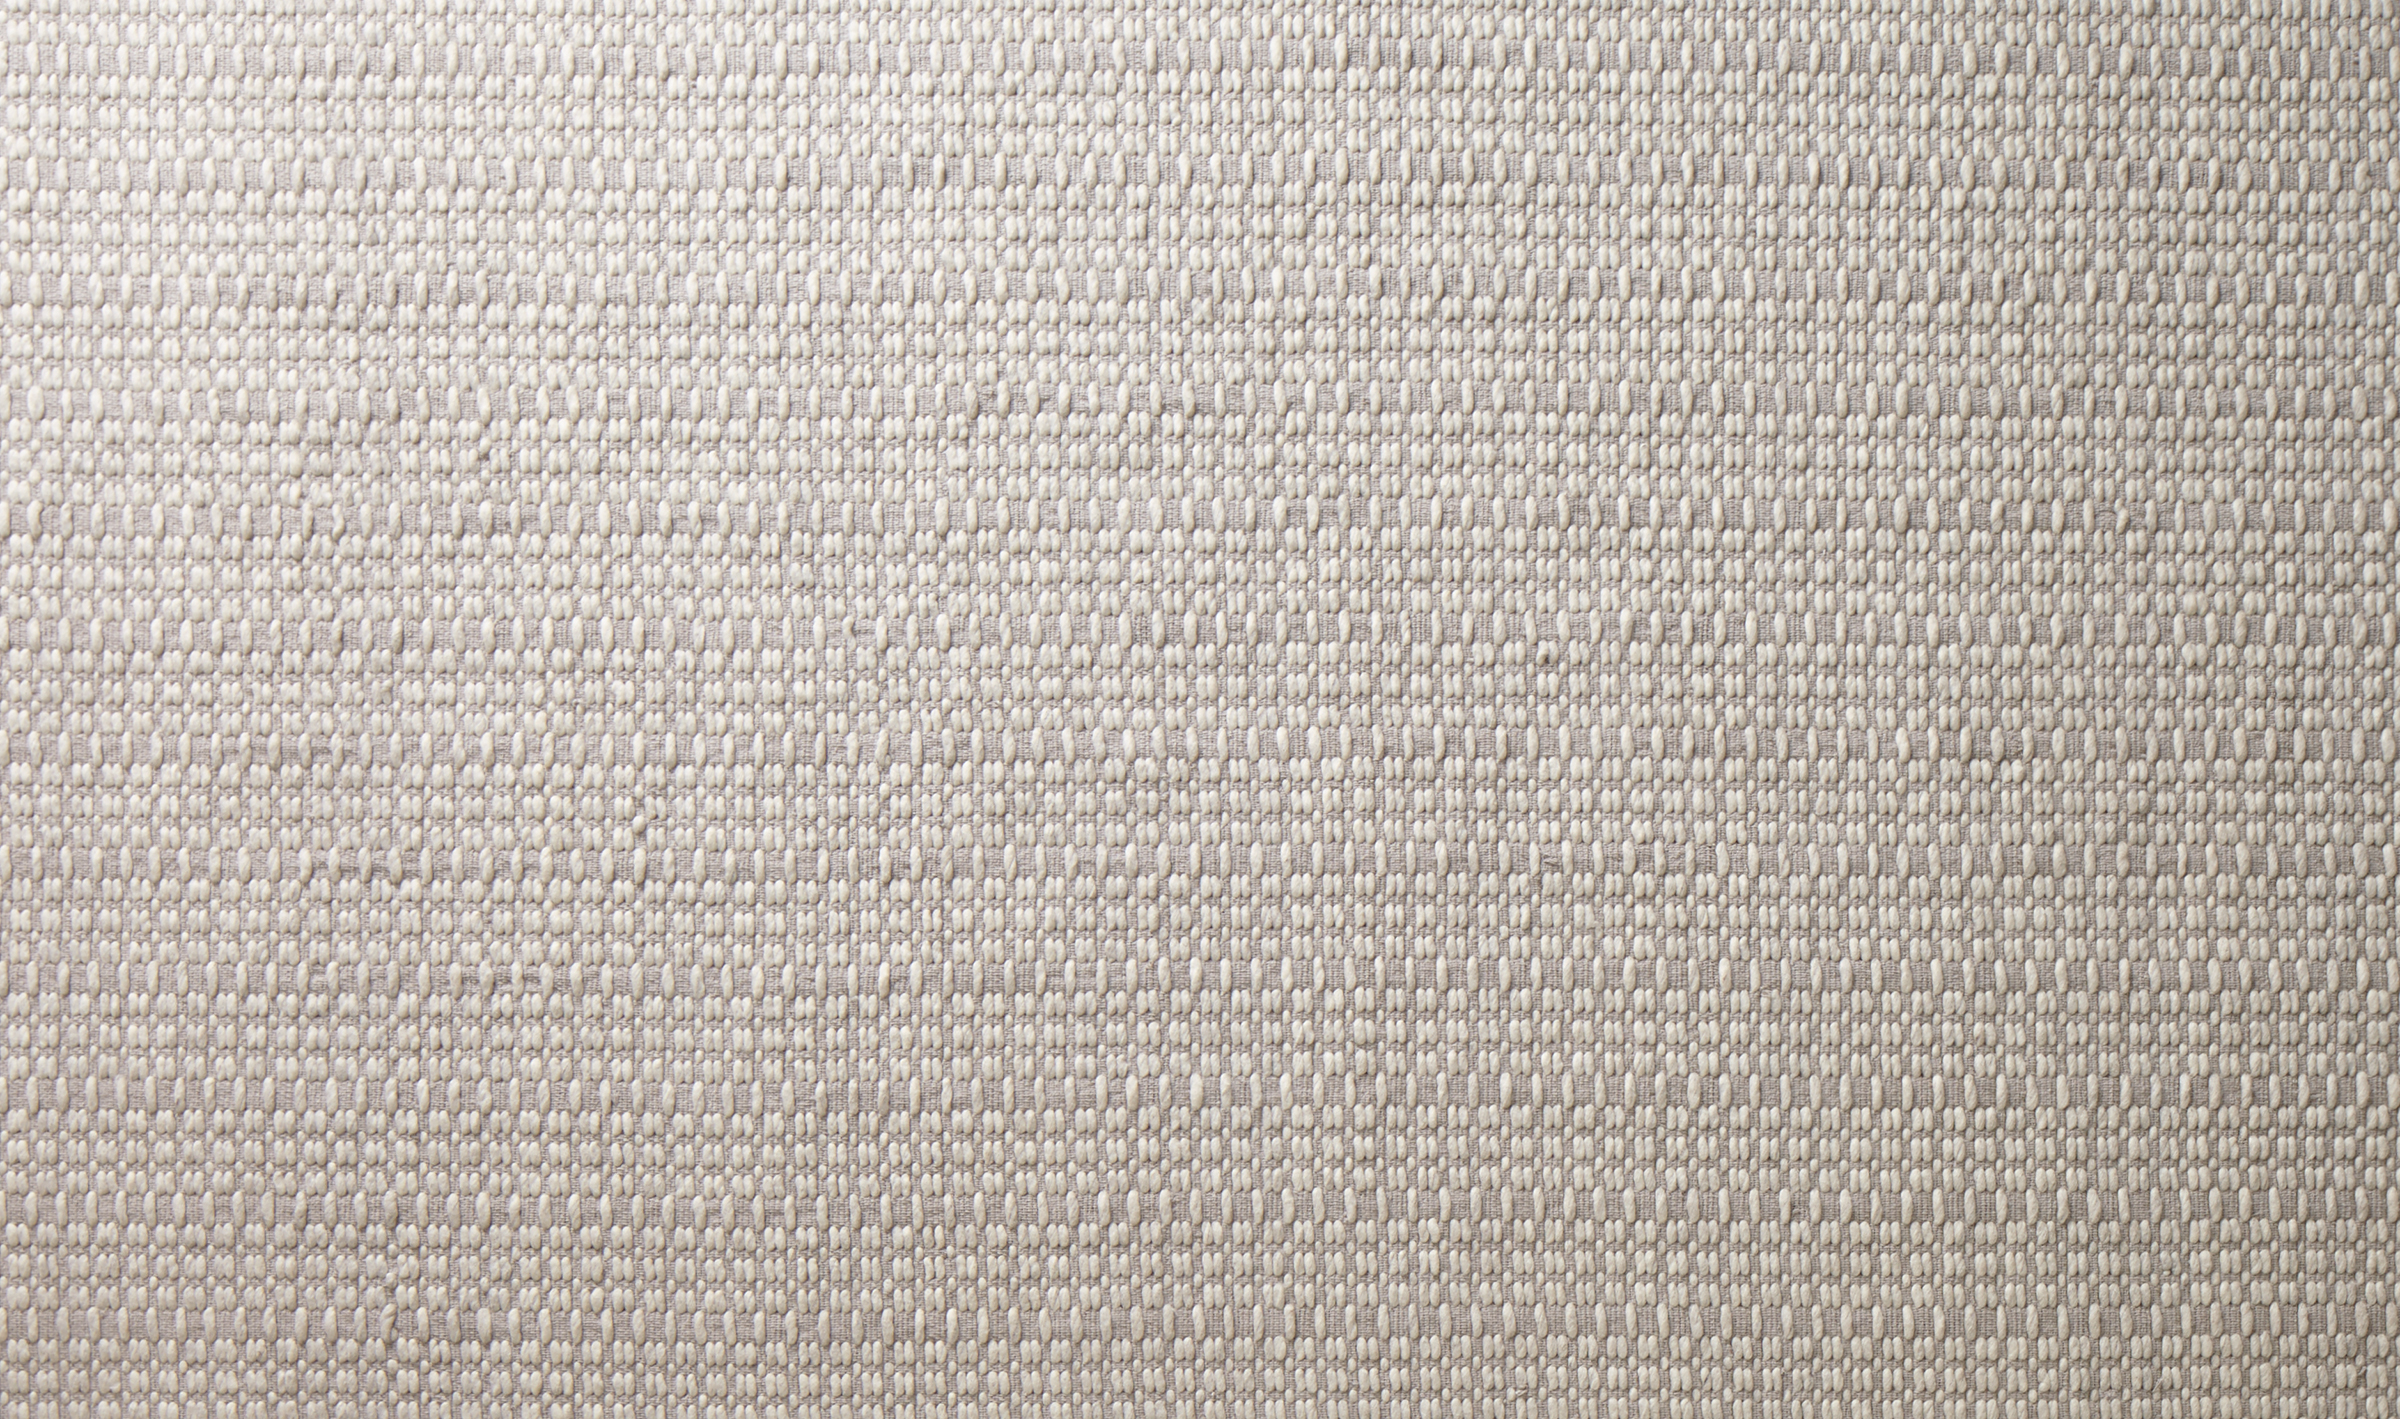 rug texture OJPVIUN